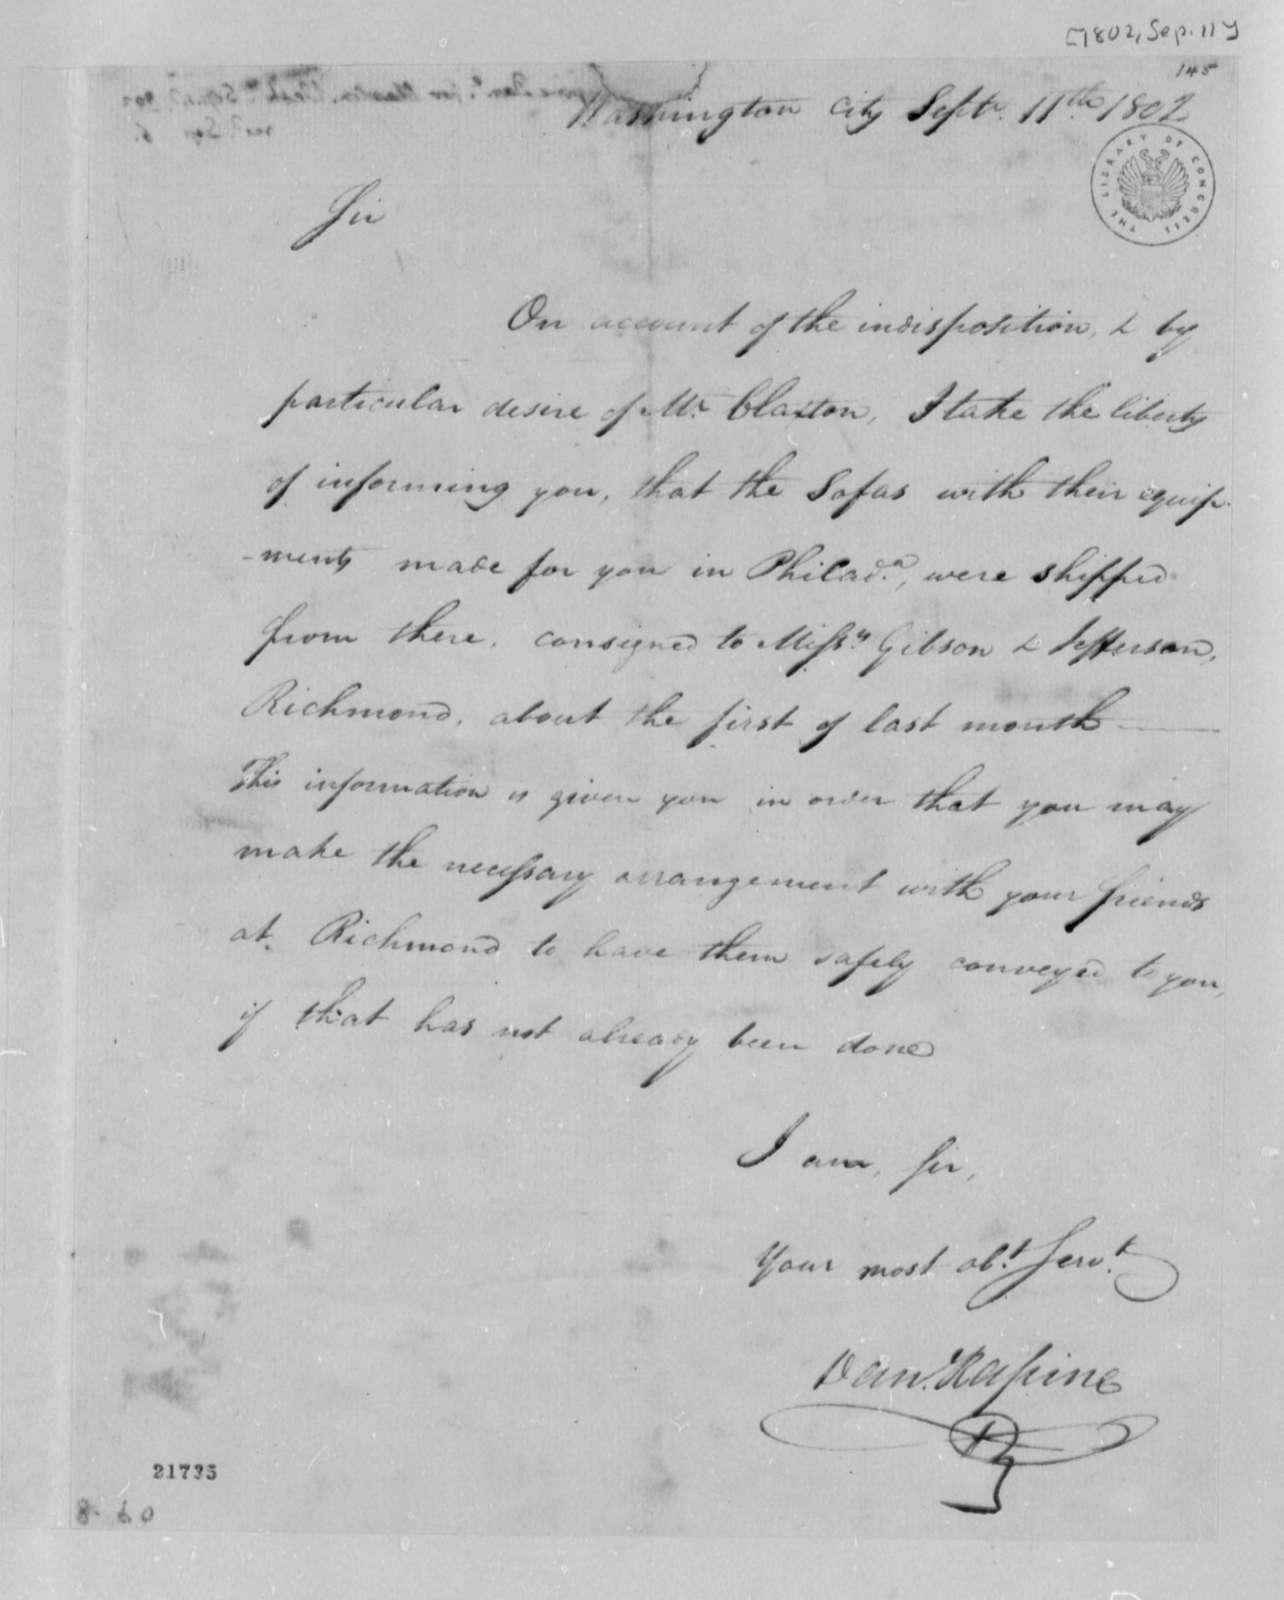 Daniel Rapine to Thomas Jefferson, September 11, 1802